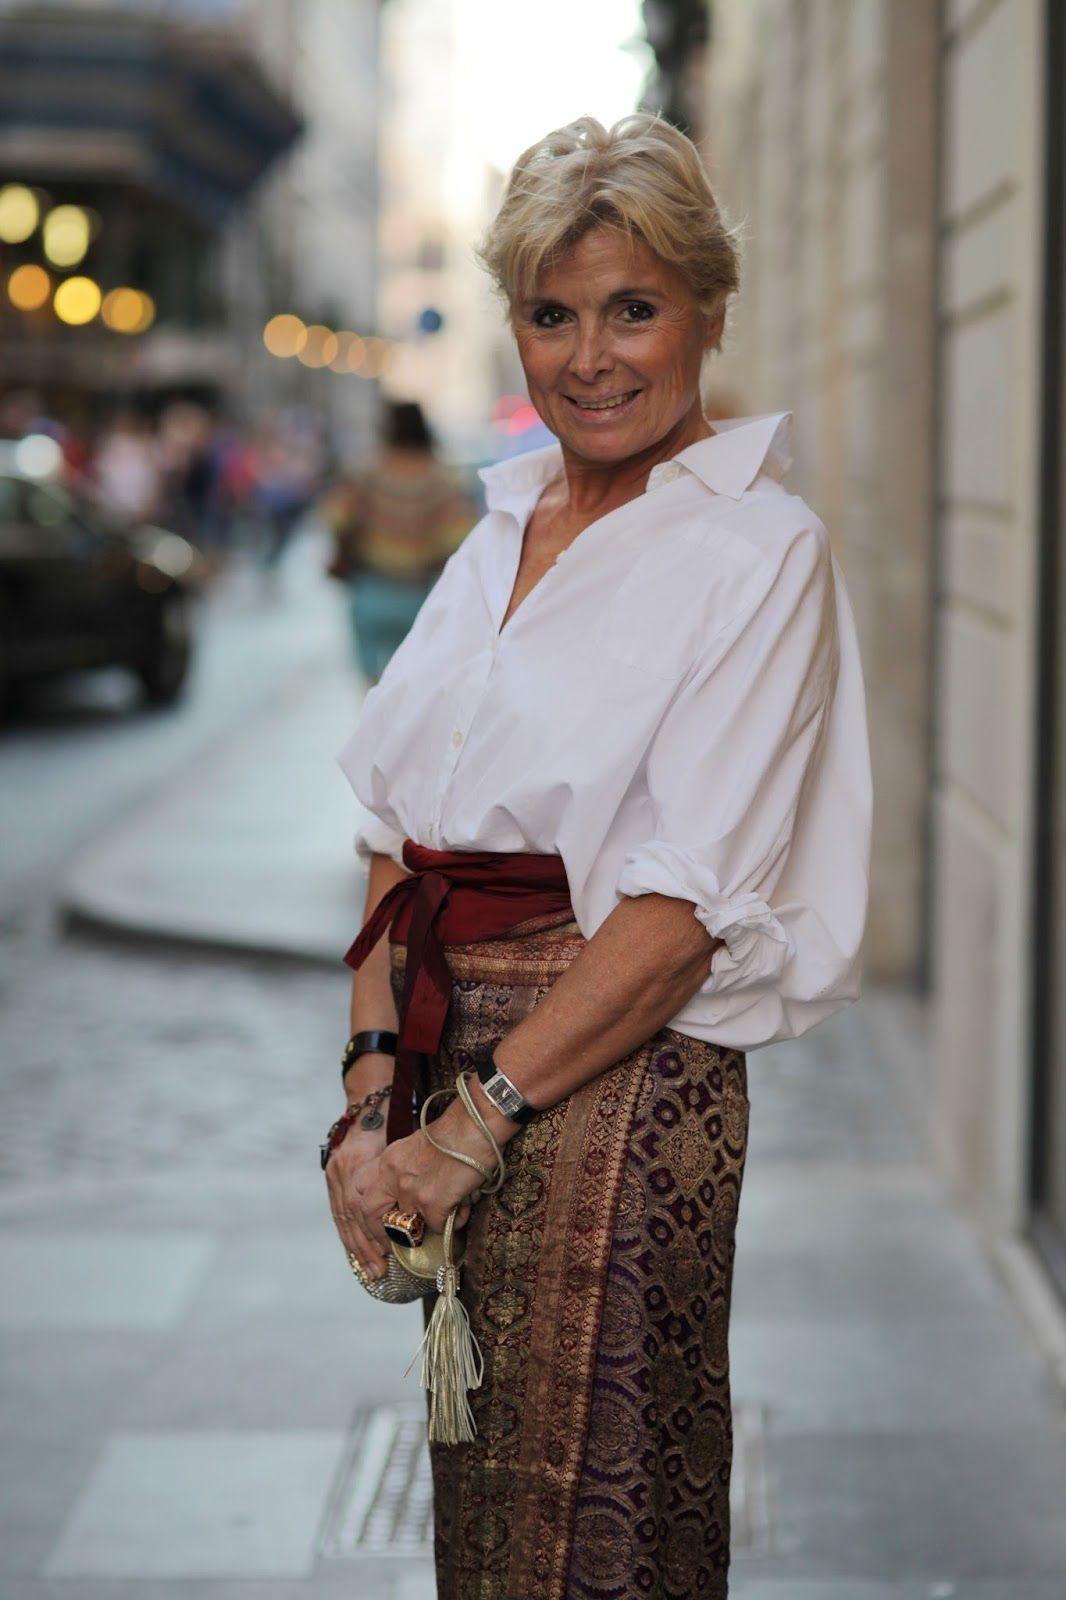 alta roma: michela zio | mode für ältere frauen, mode, frau